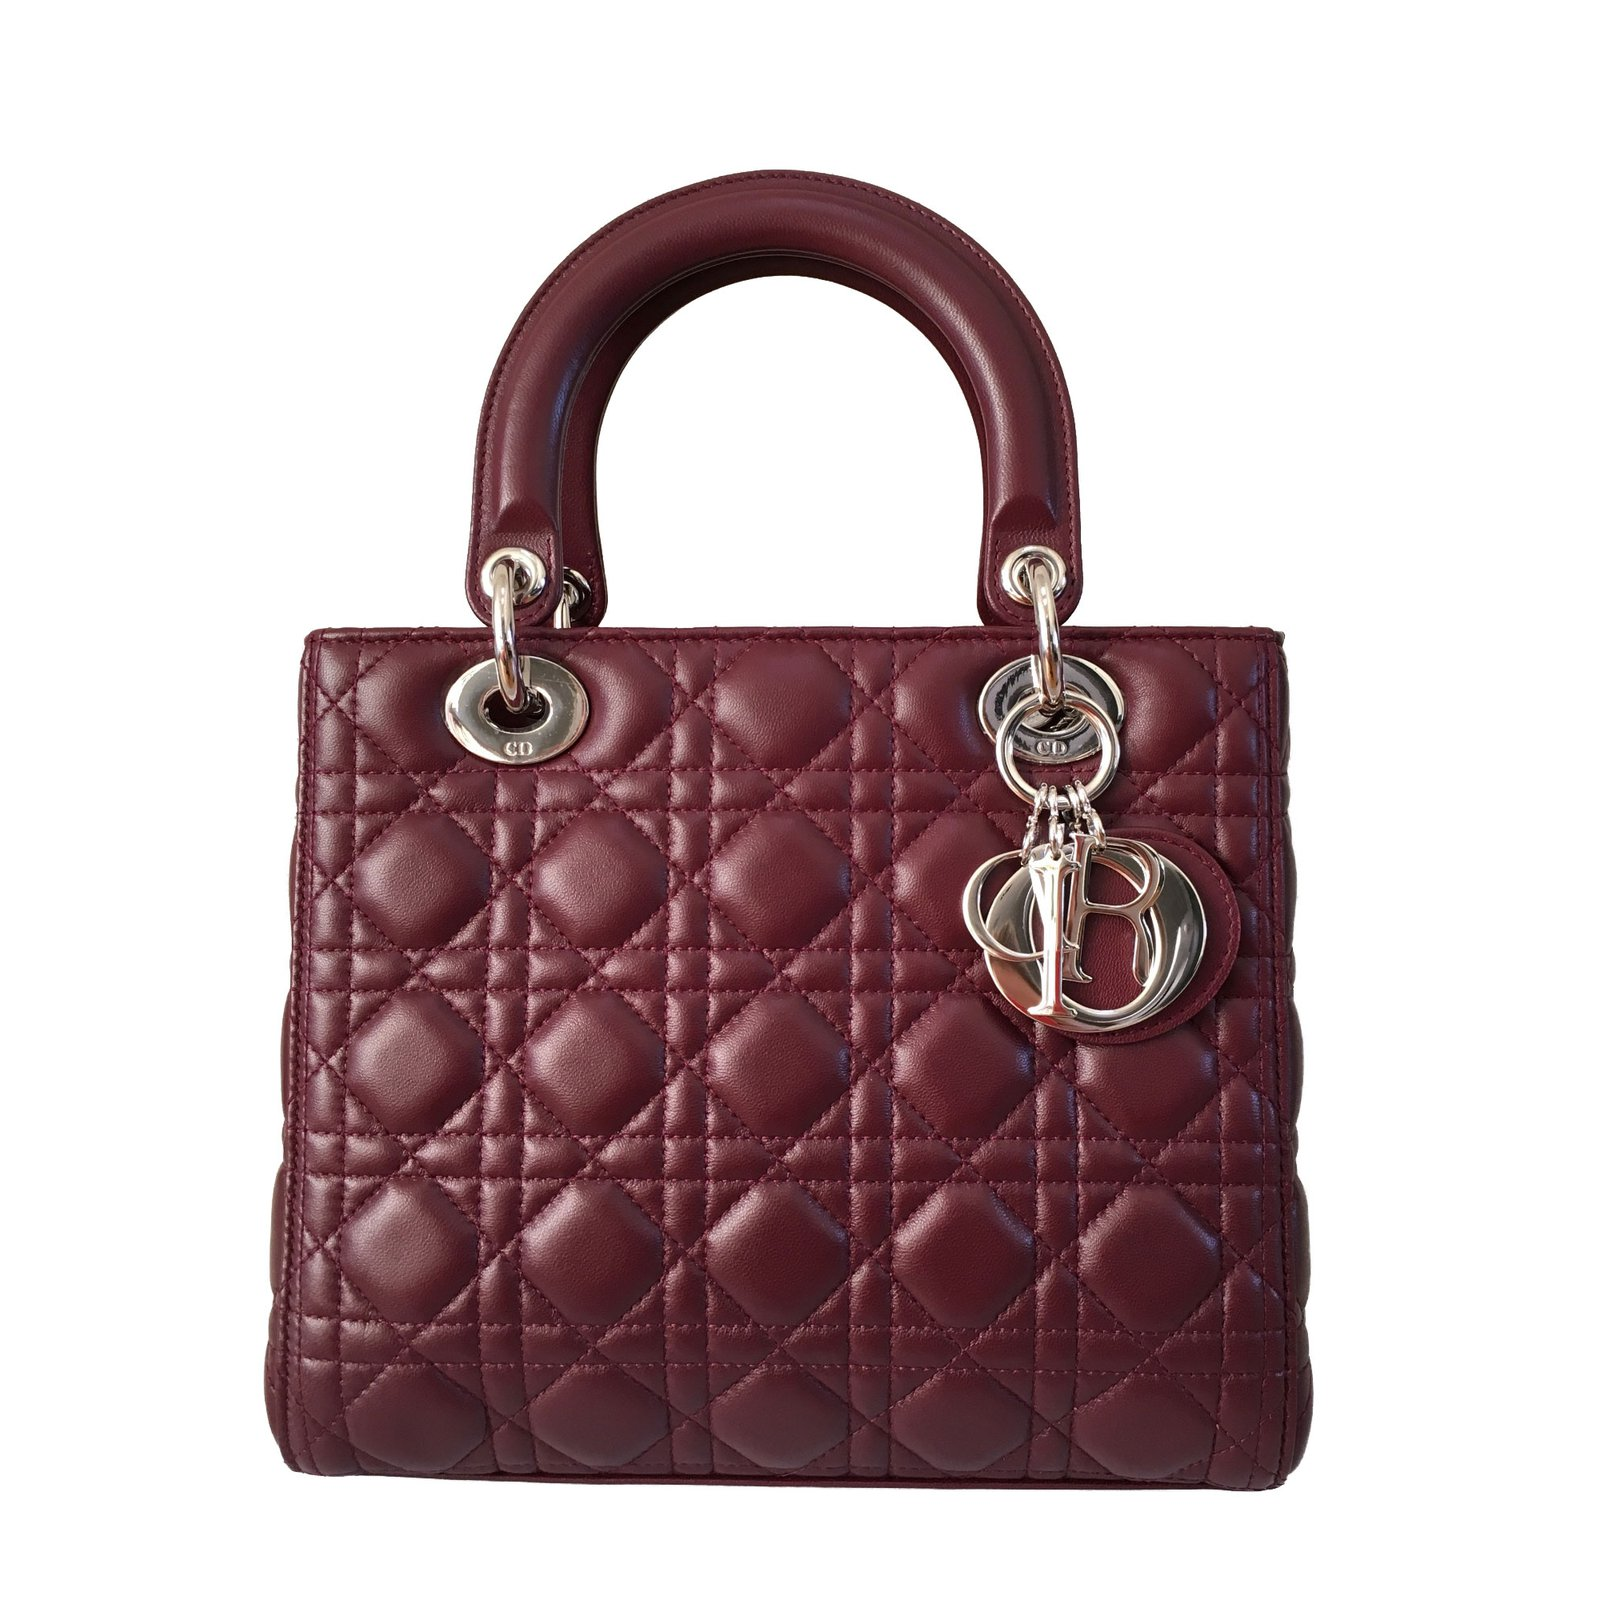 christian dior lady dior handbags lambskin dark red joli closet. Black Bedroom Furniture Sets. Home Design Ideas